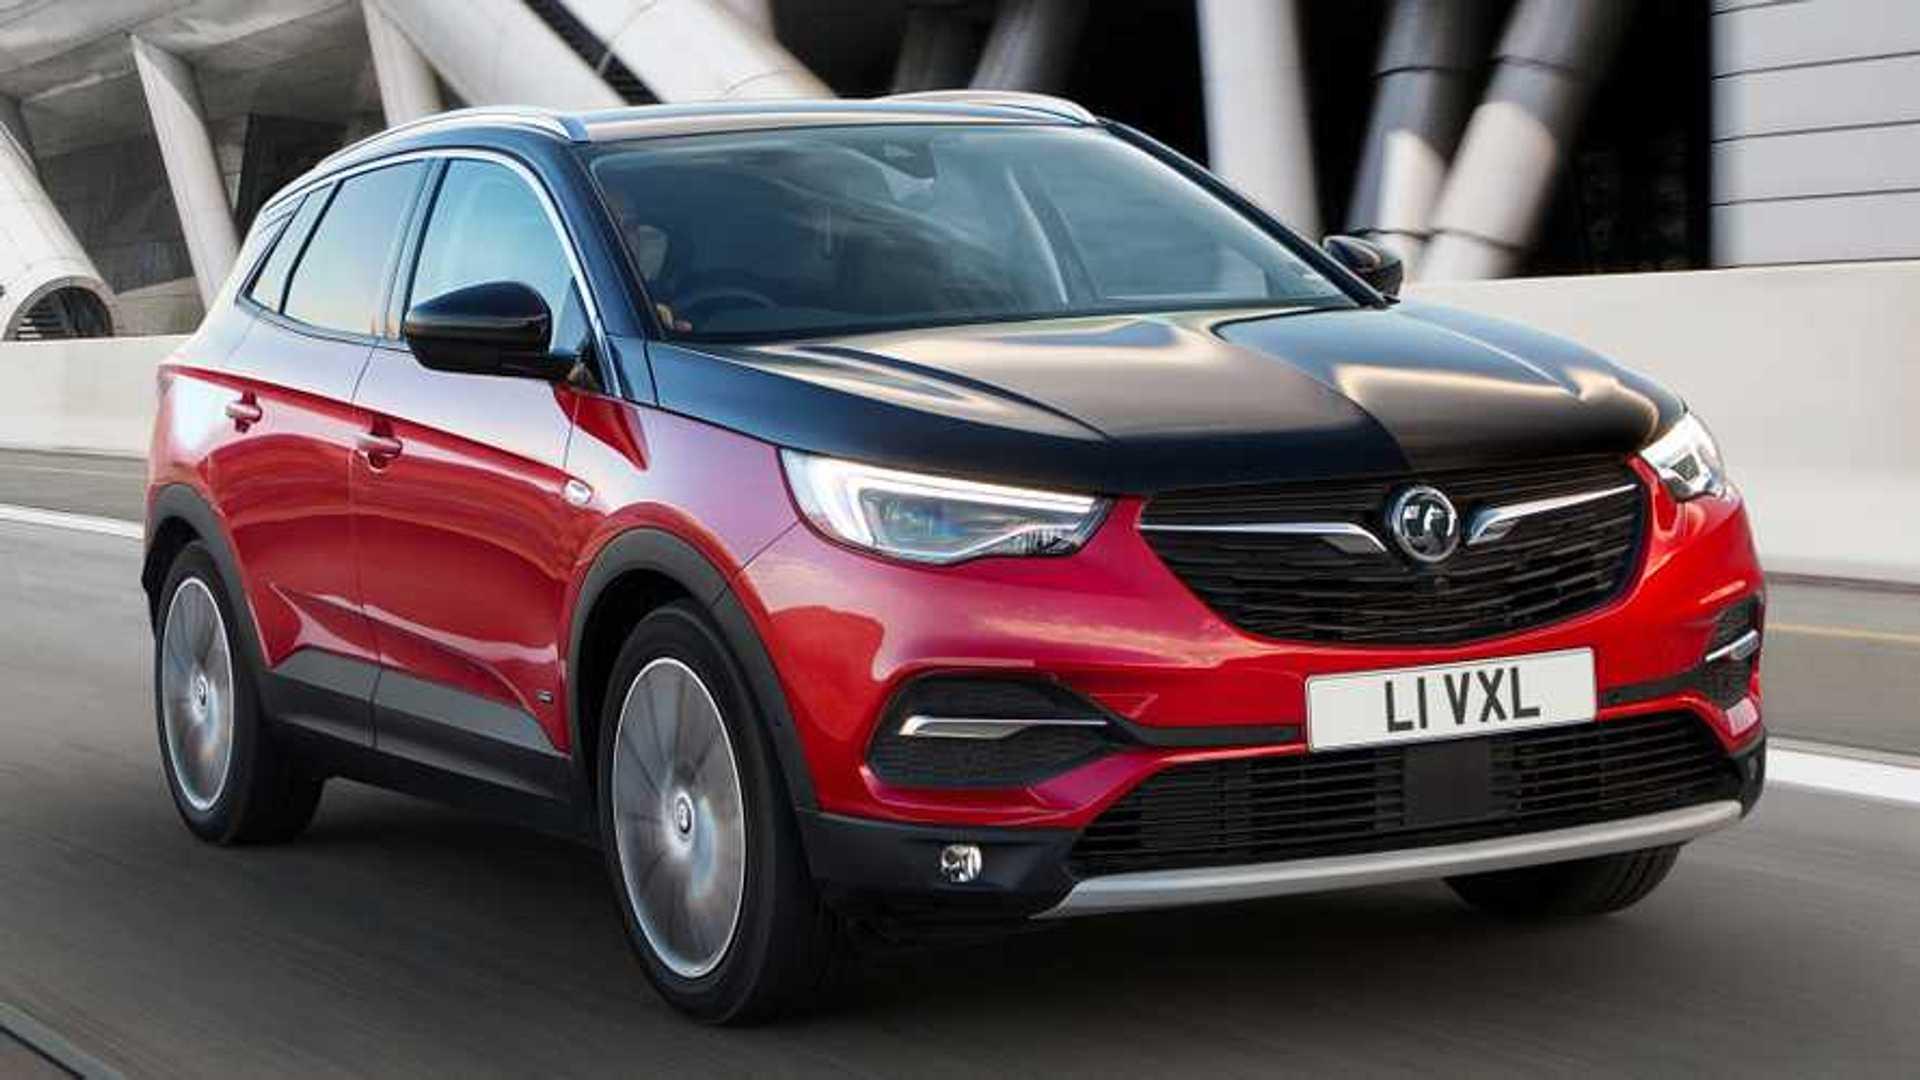 Vauxhall Adds Plug-in Hybrid Tech To Grandland X Range